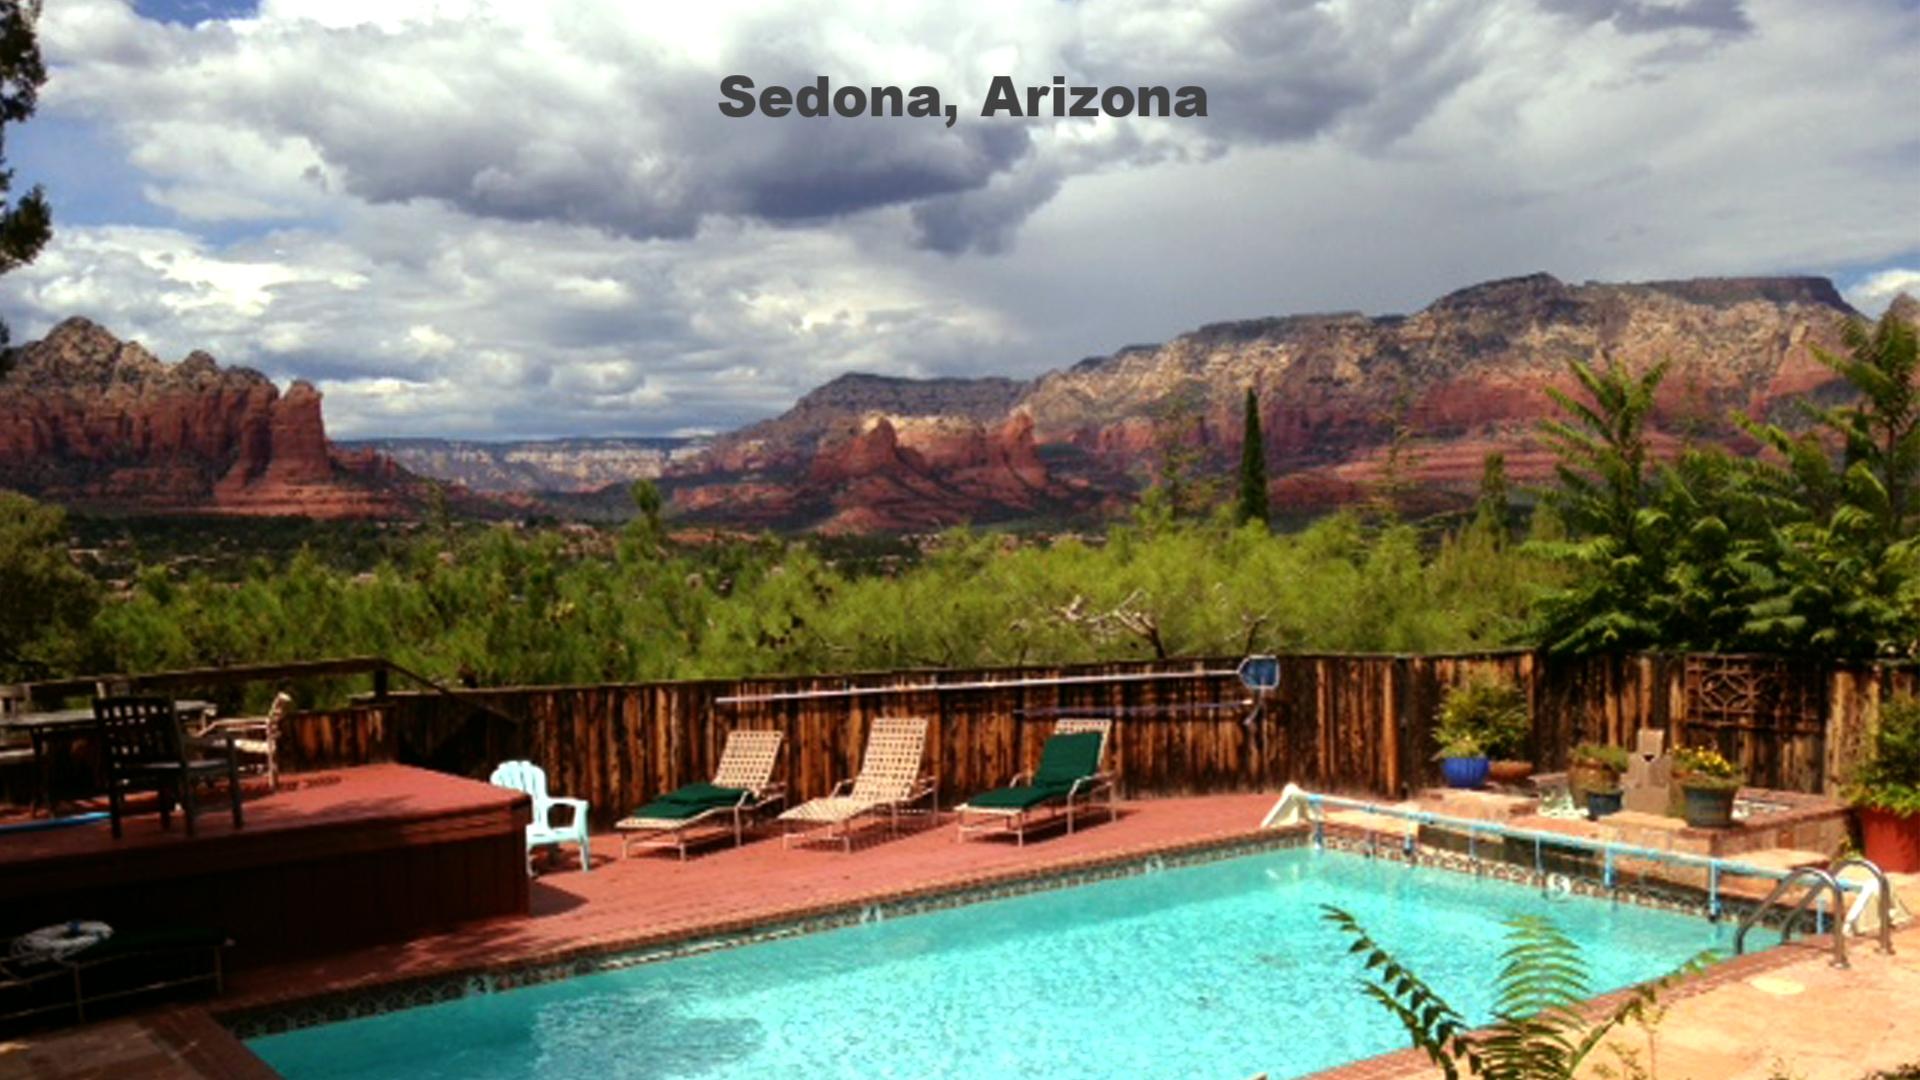 Sedona, Arizona.jpg